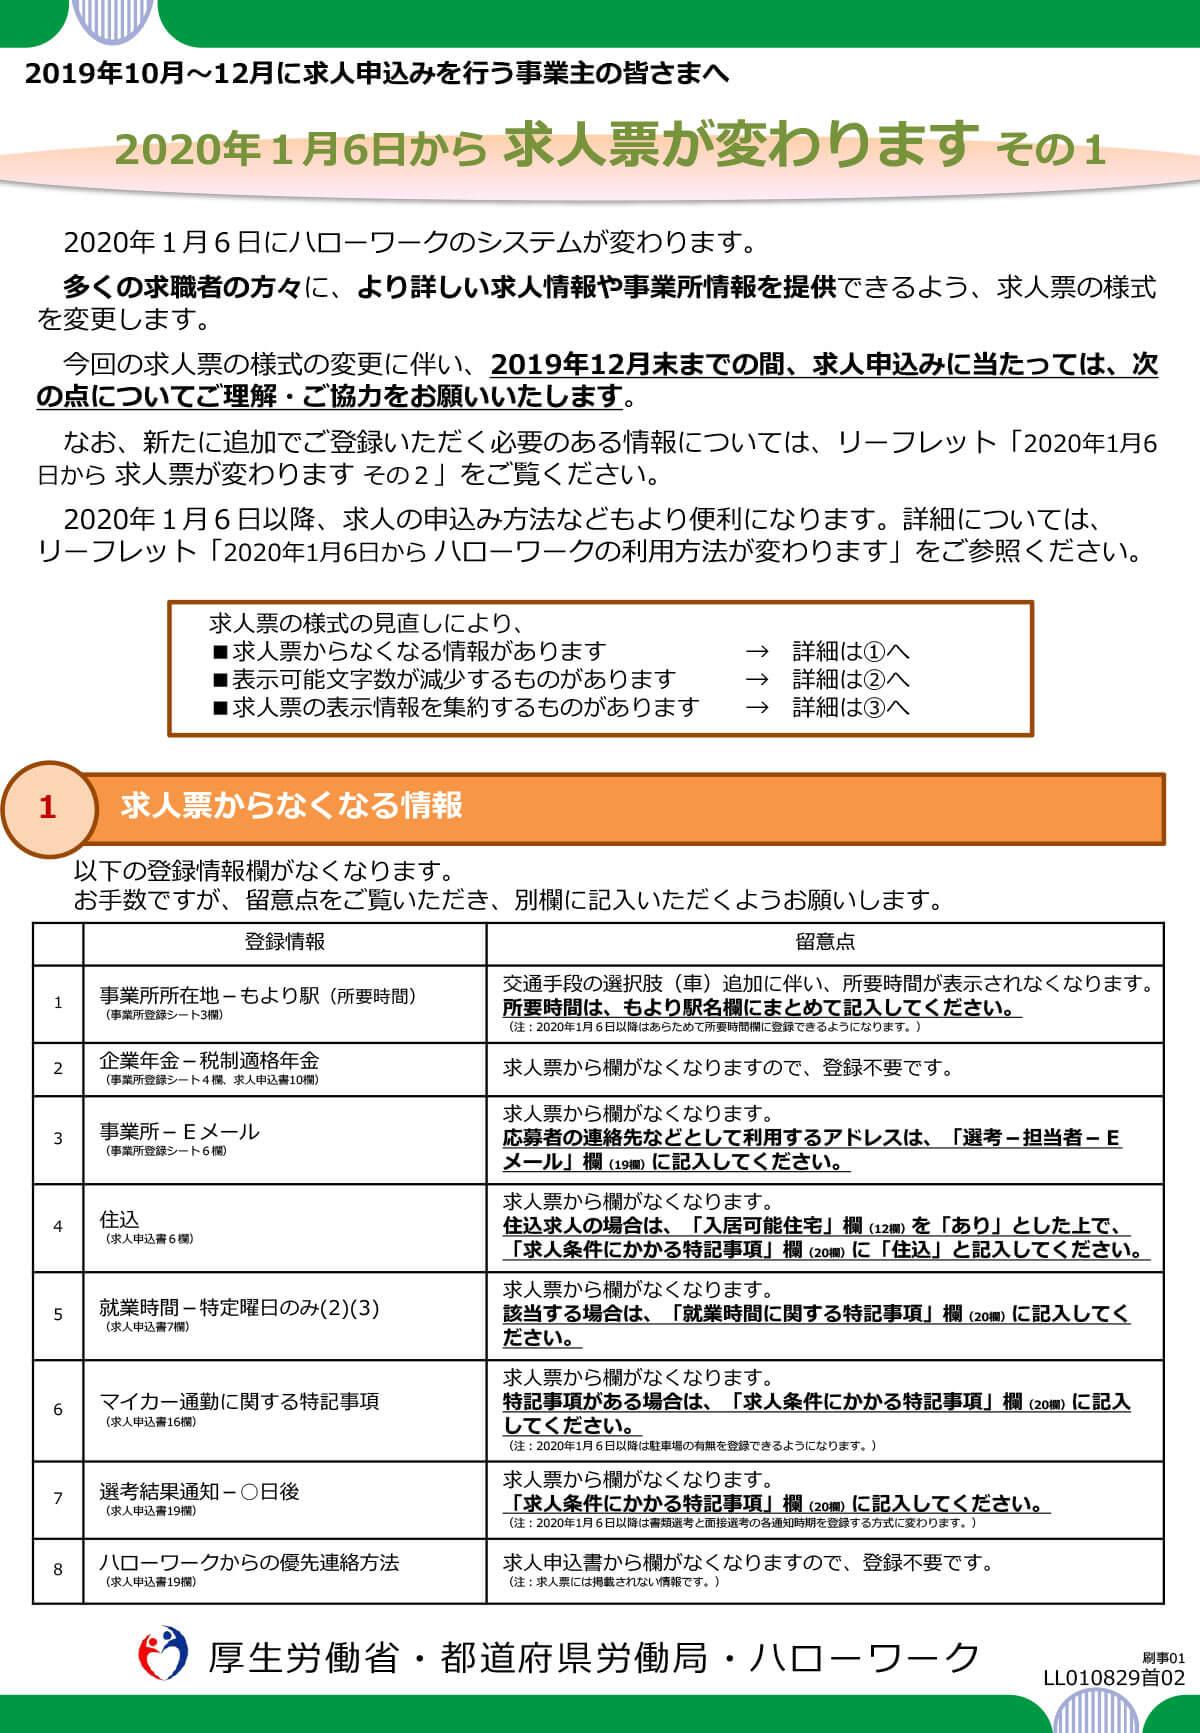 20200106-4-job_posting-1-1